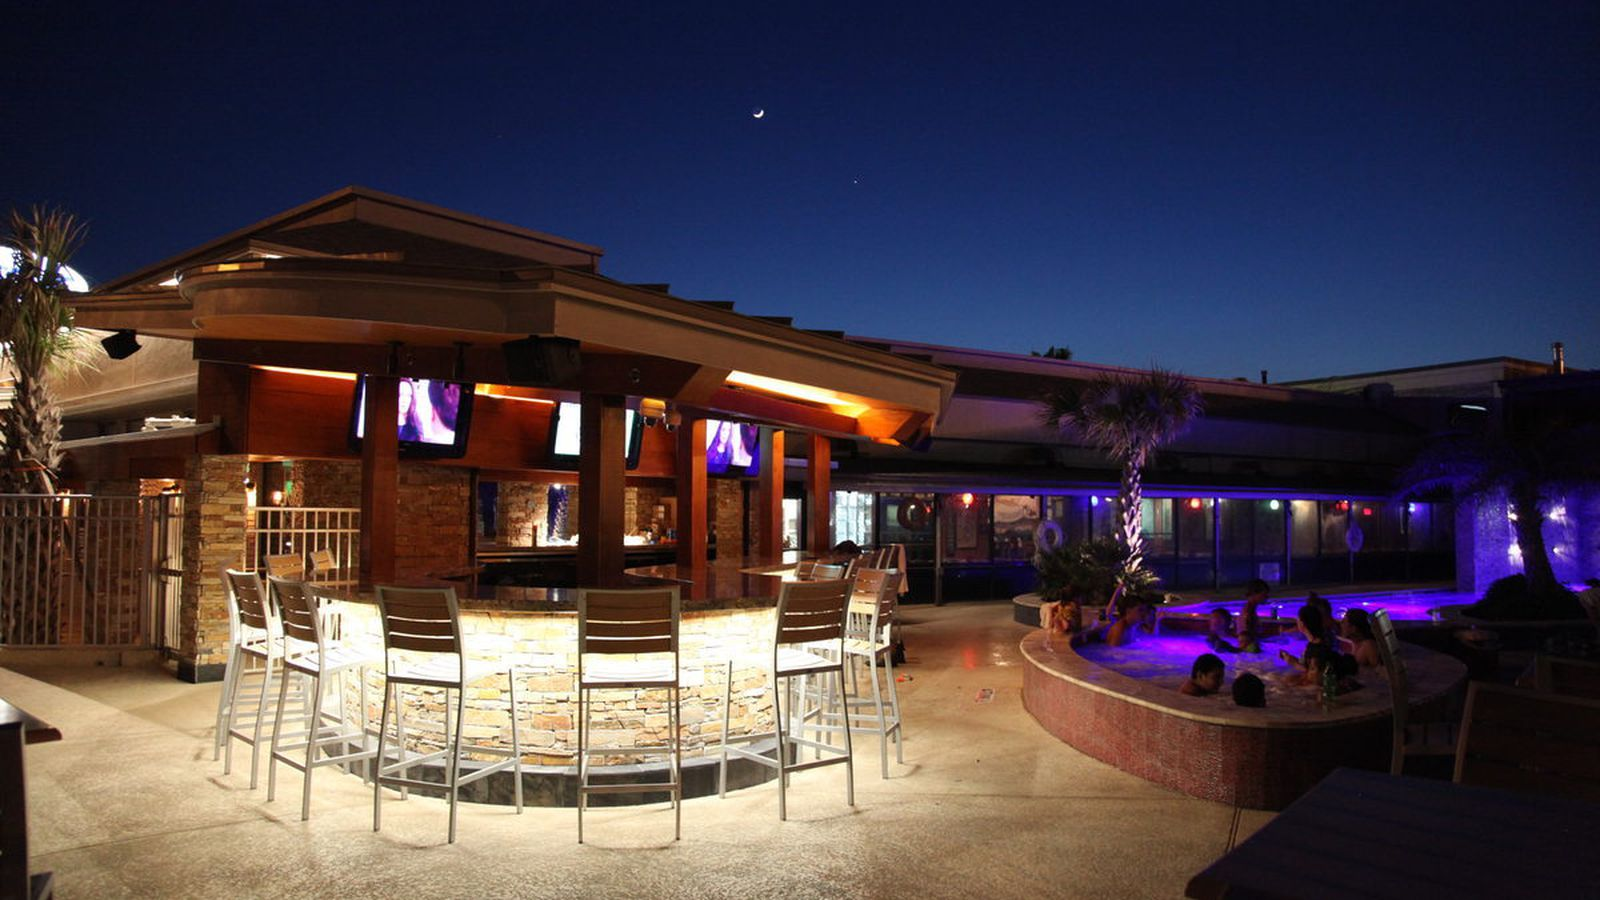 Nick S Kitchen And Beach Bar Menu